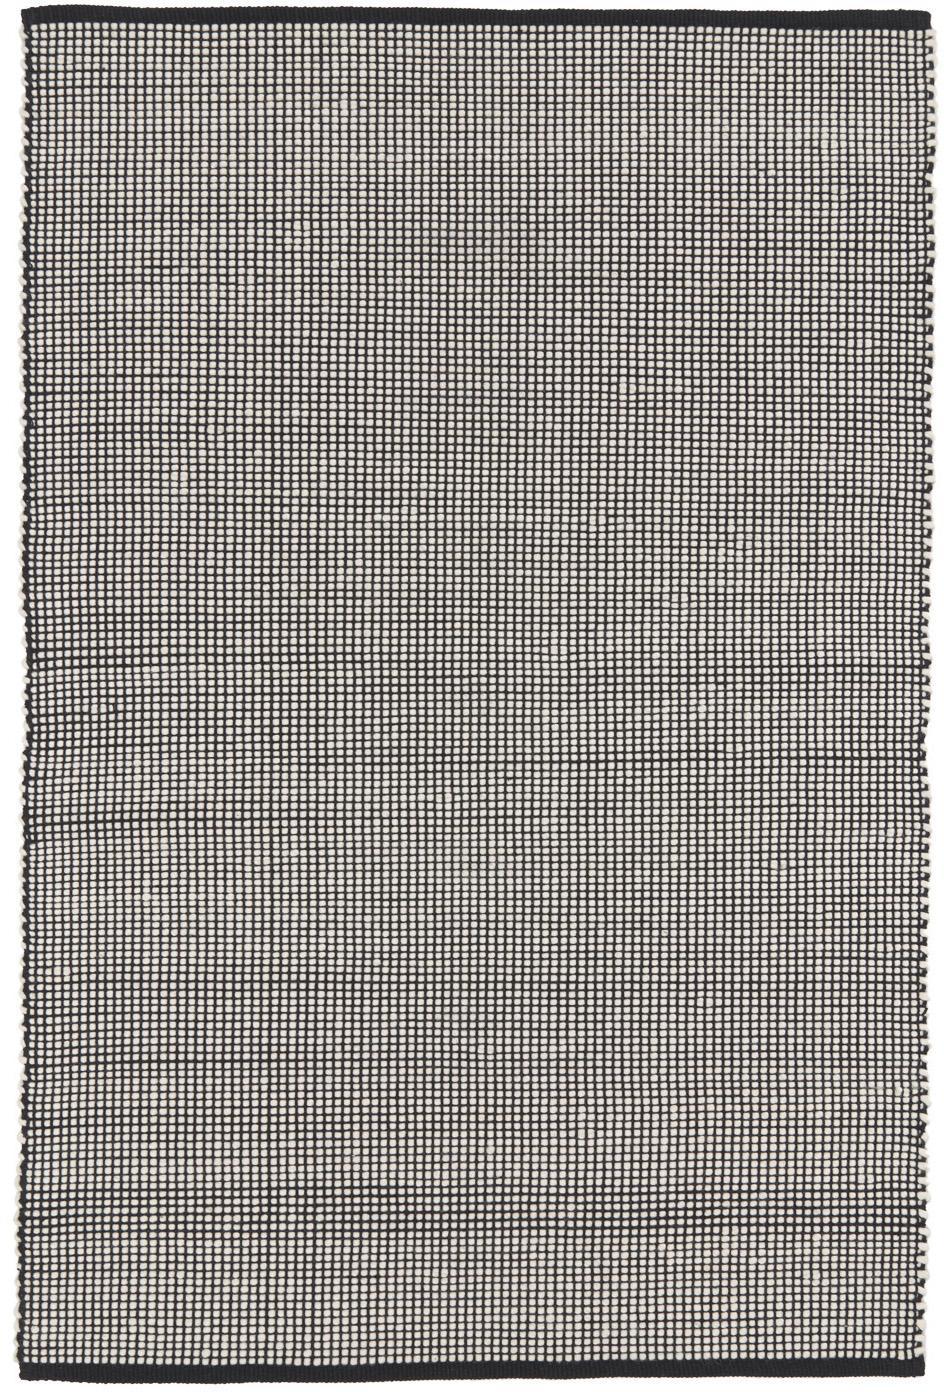 Alfombra de lana tejida artesanalmente Amaro, Negro, blanco crema, An 200 x L 300 cm (Tamaño L)